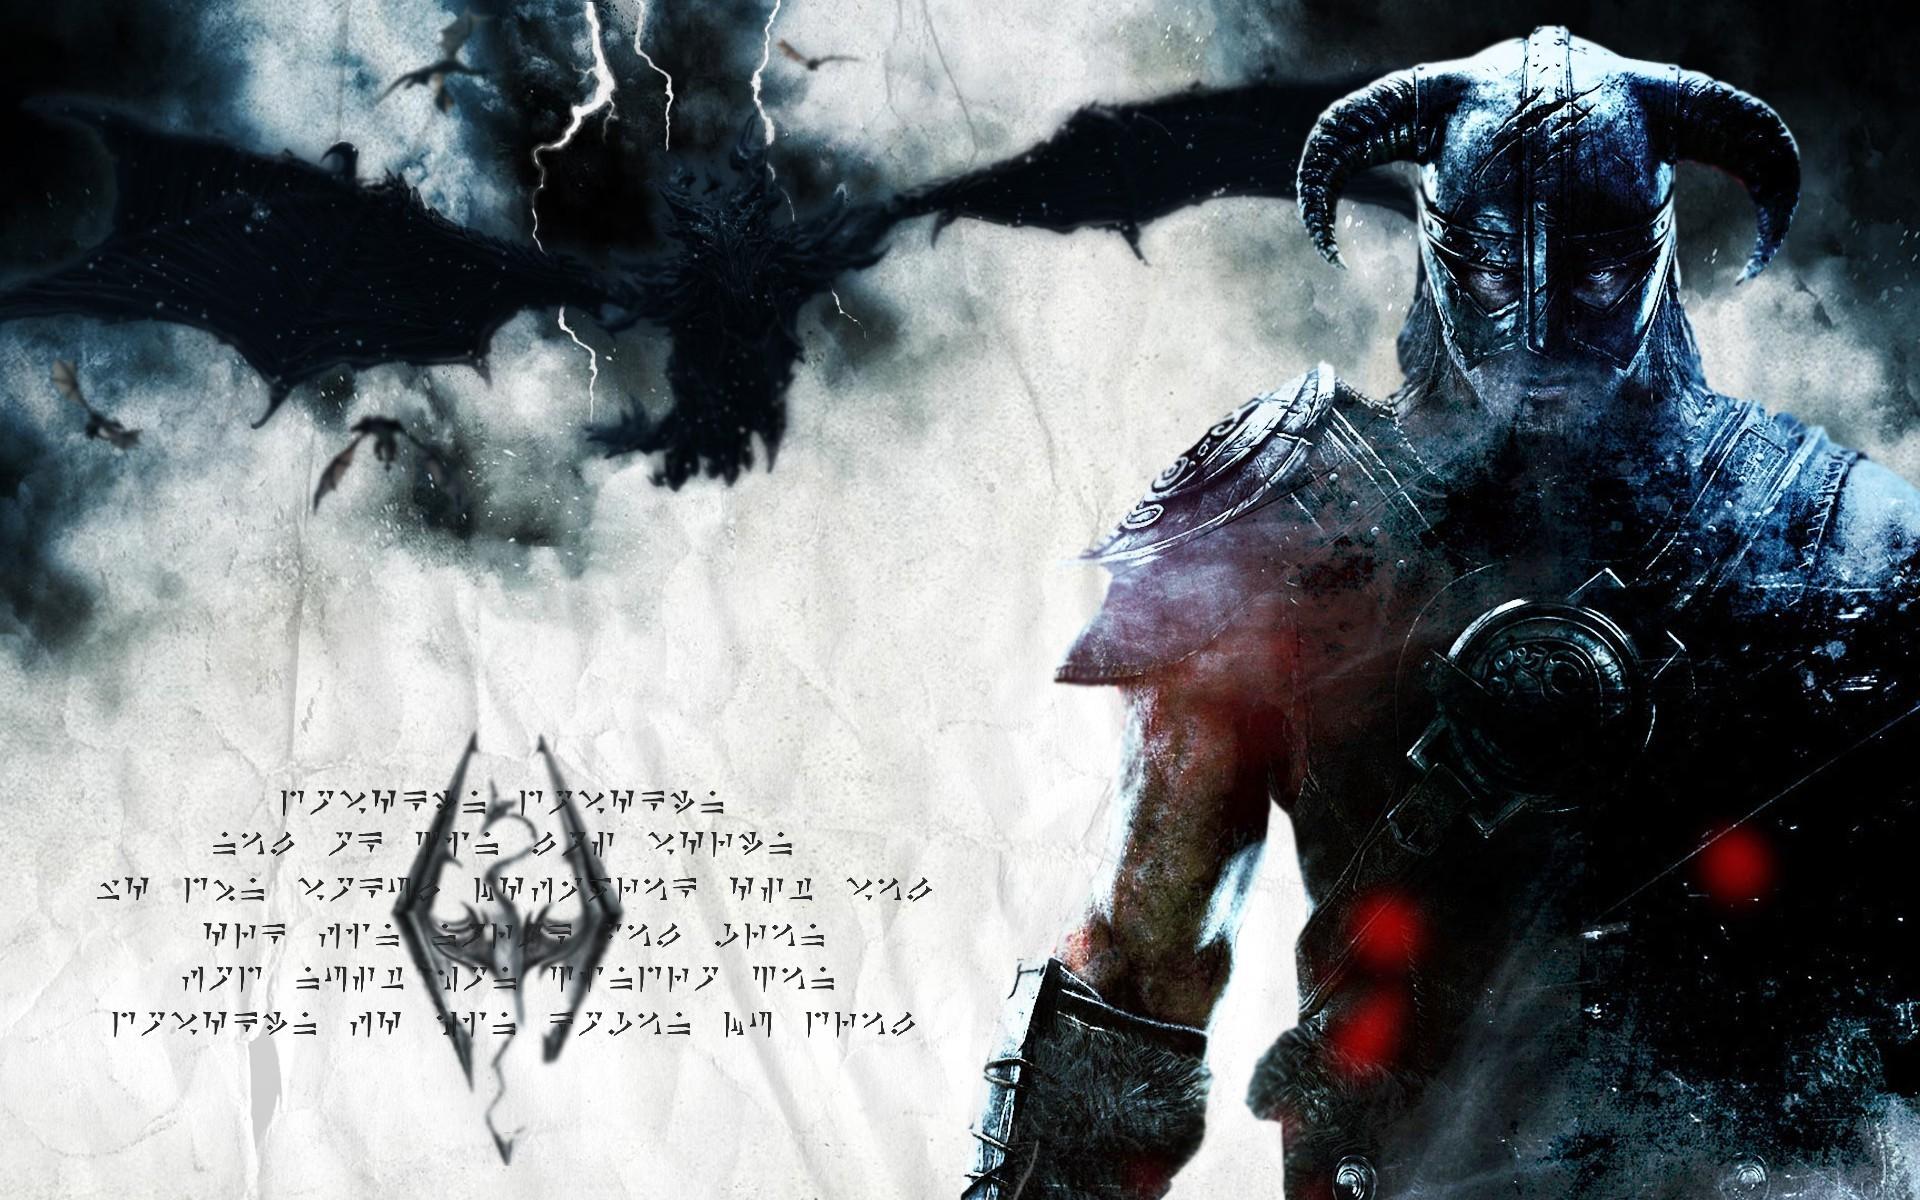 Dragon, The Elder Scrolls V: Skyrim, Dragonborn, Dovahkiin Wallpaper HD